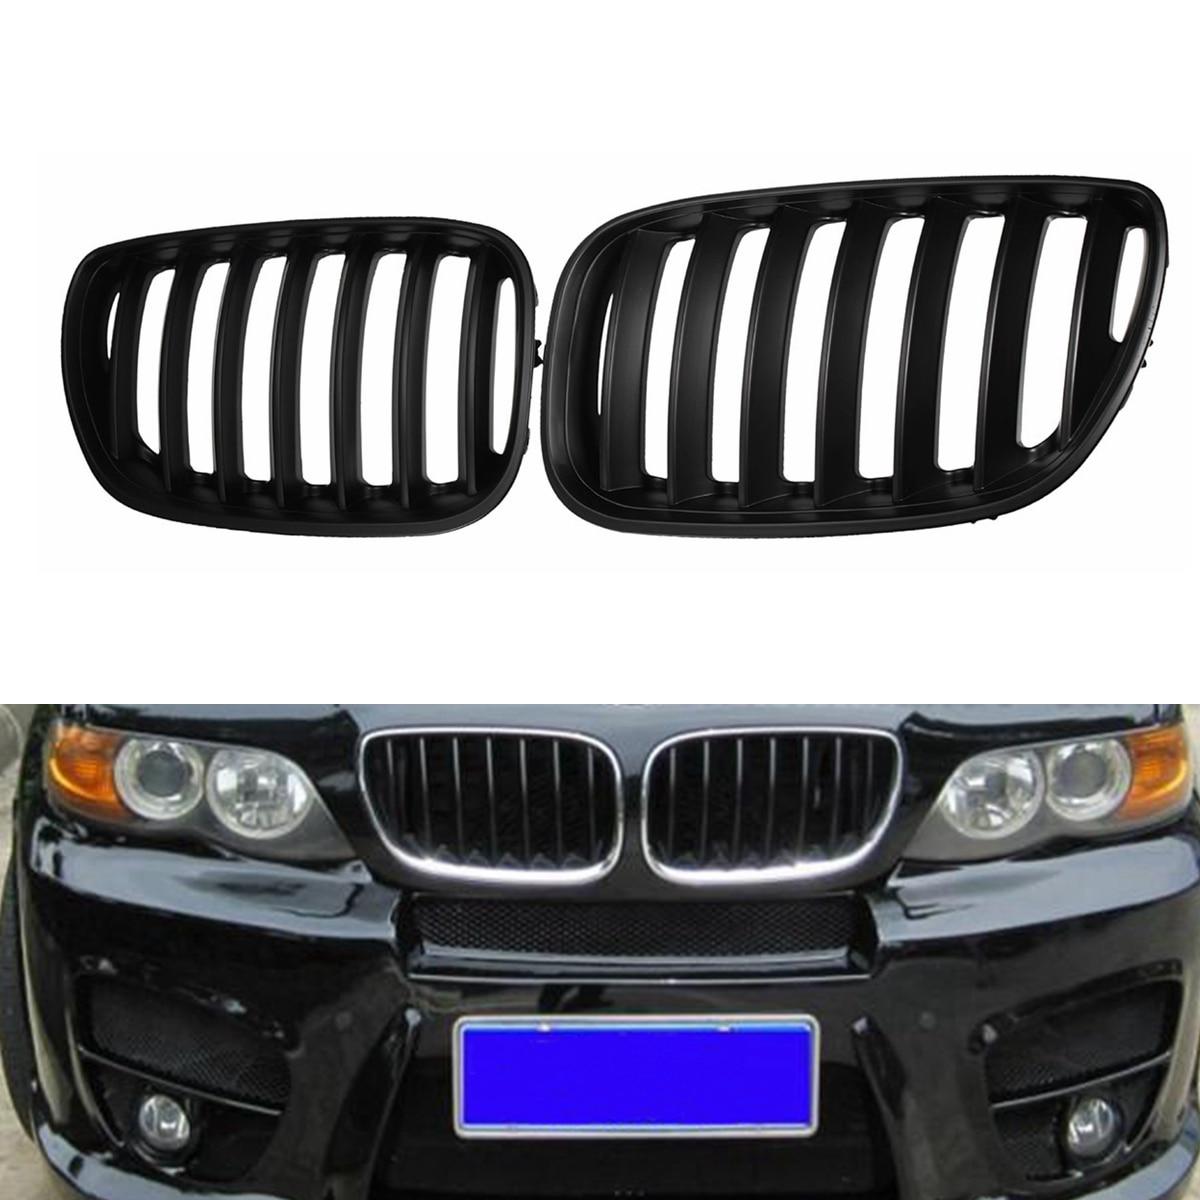 Pair Matte Black Chrome Front Bumper Grille Front Hood Kidney Sport Grills Grille for BMW X5